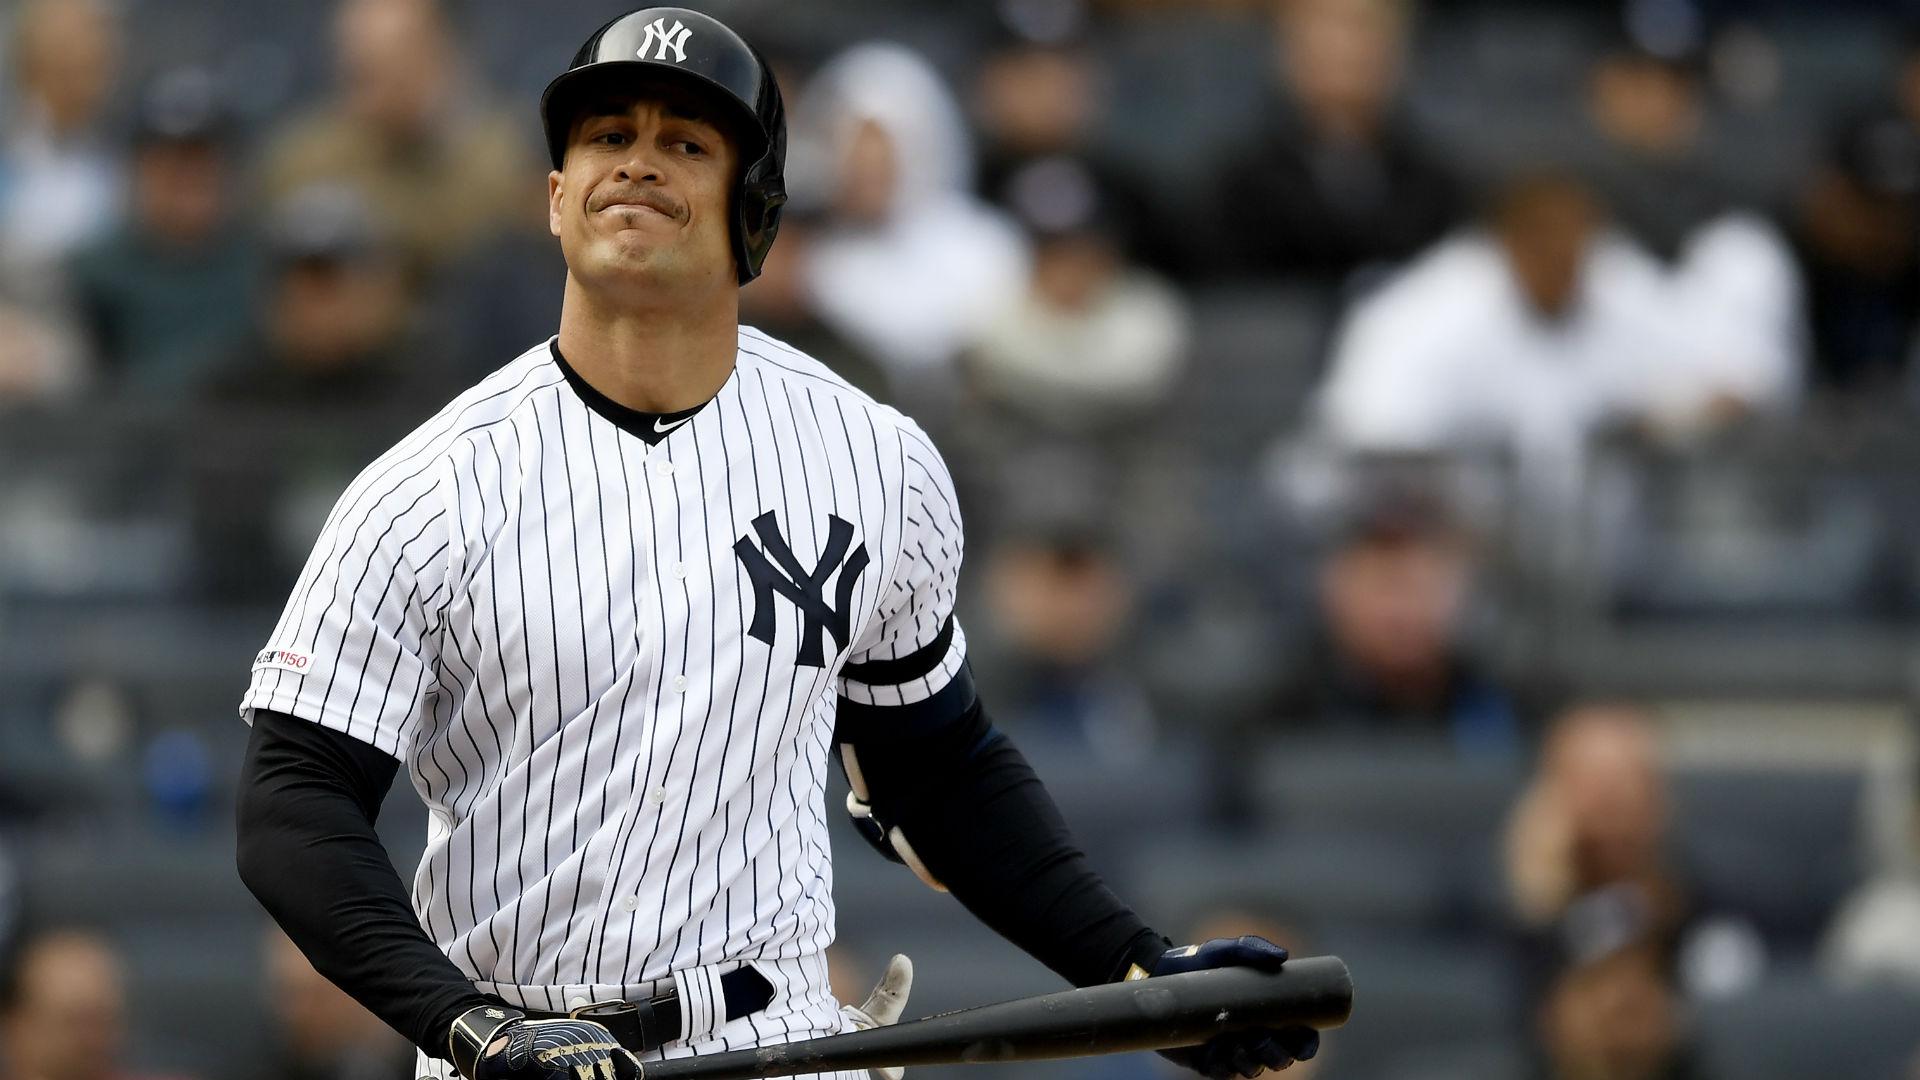 Giancarlo Stanton injury update: Yankees star's status unclear after MRI on knee